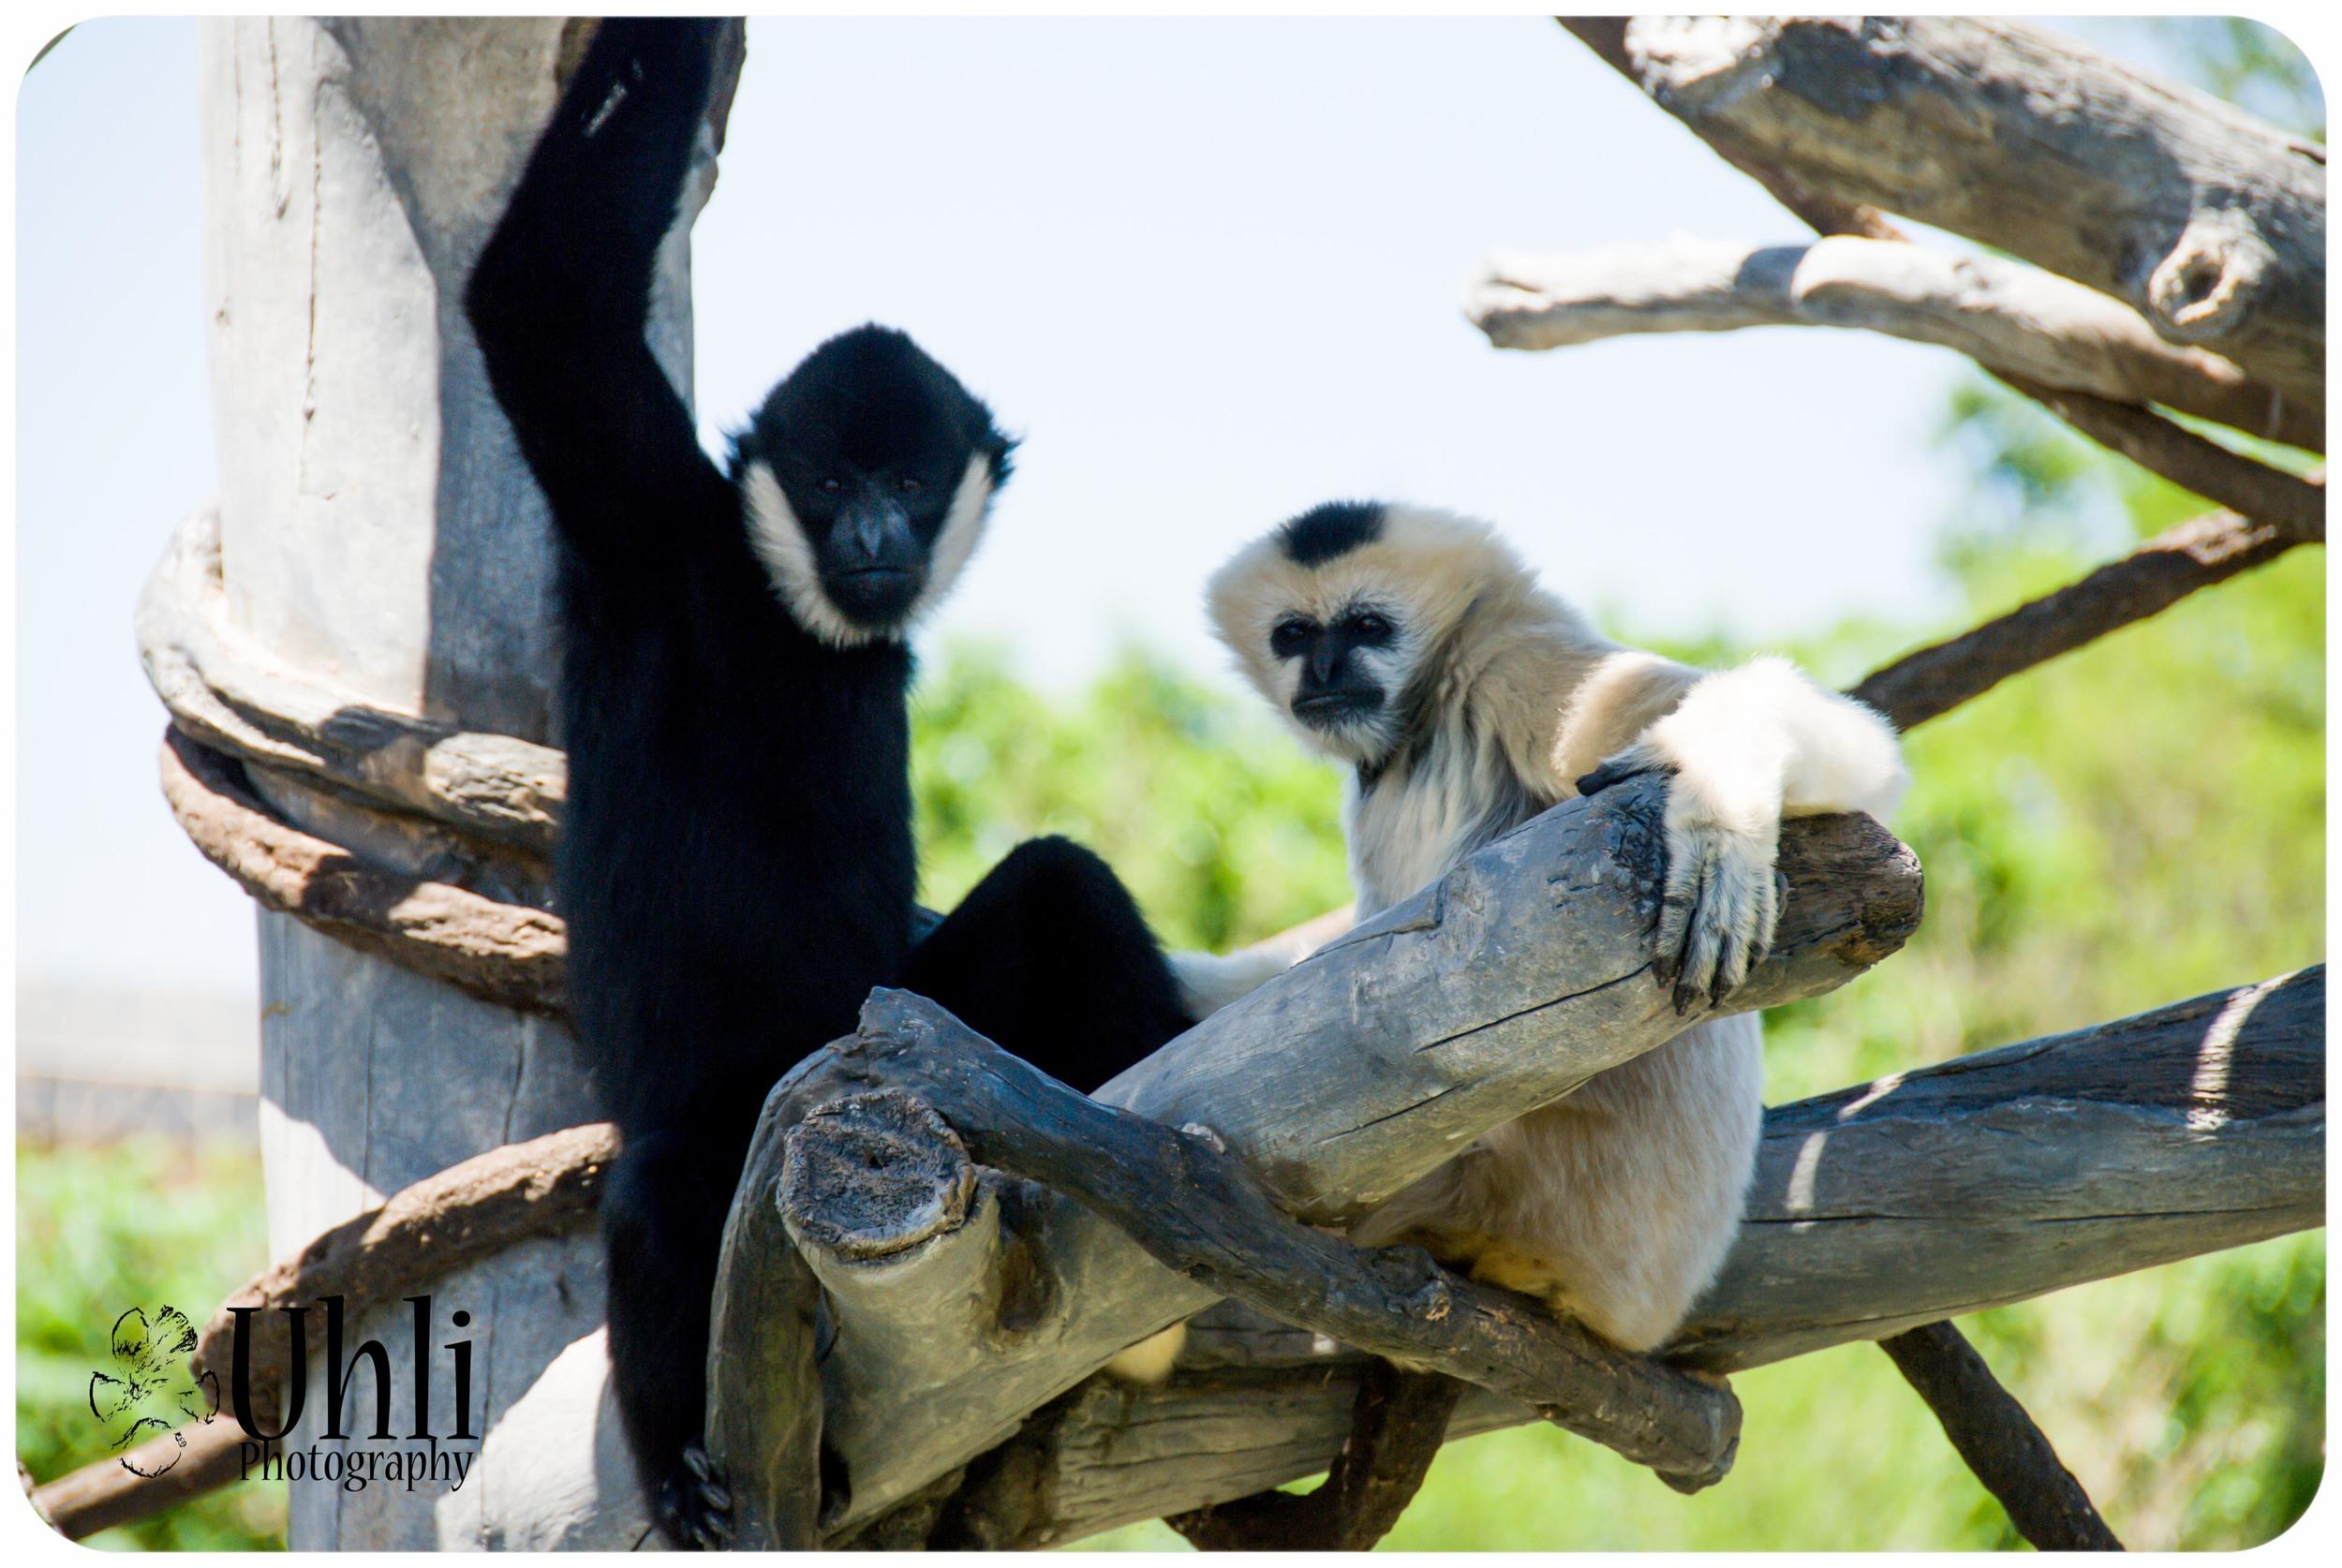 6.9.13 - Zoo Venture, Monkeys!